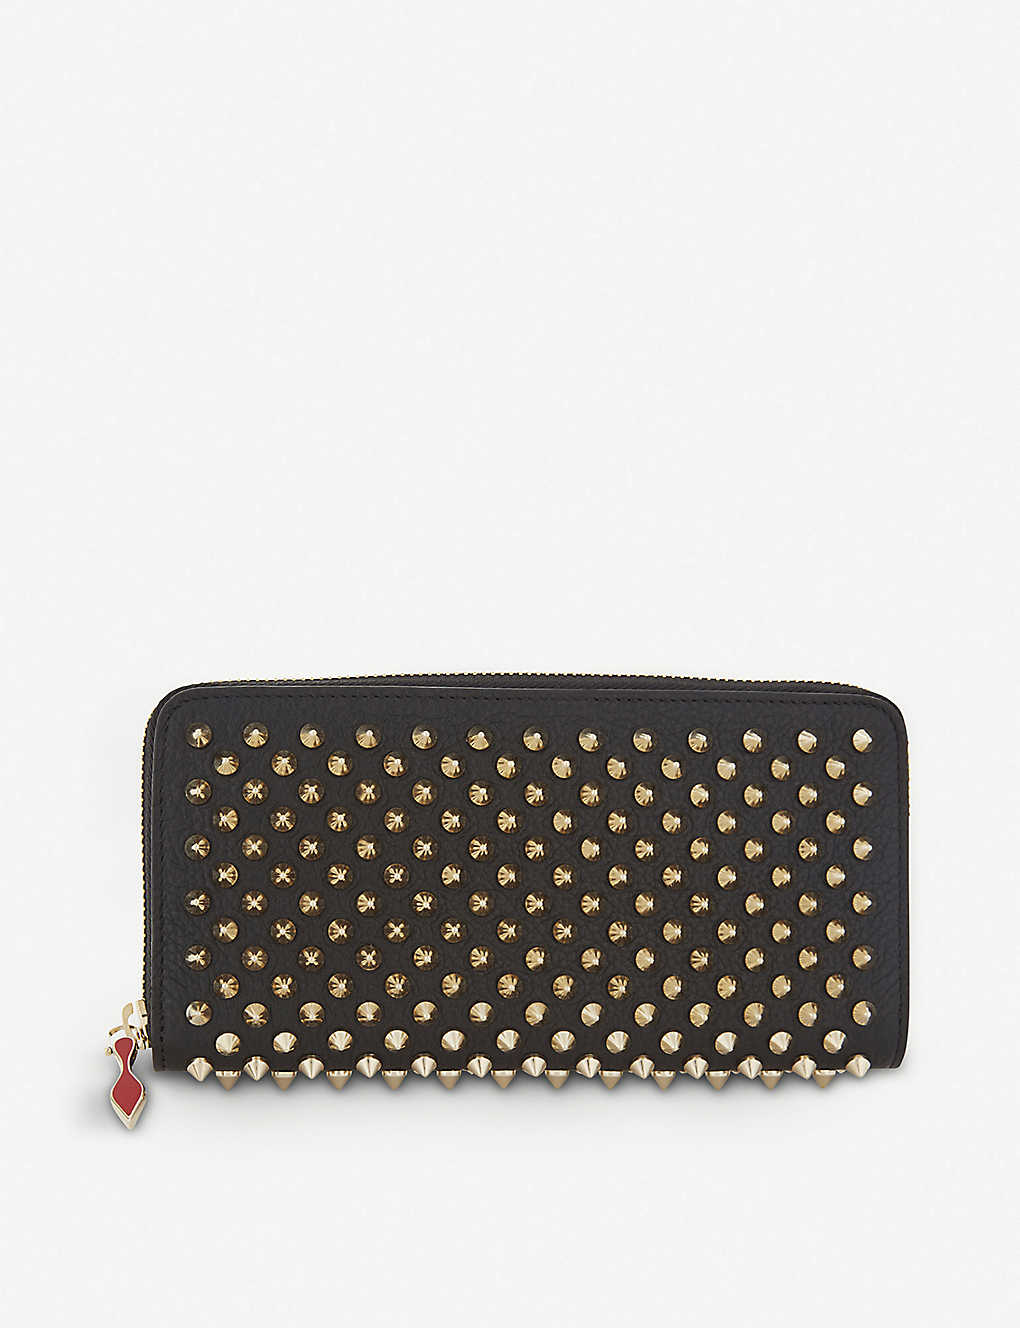 03005c53e4 CHRISTIAN LOUBOUTIN - Panettone leather wallet | Selfridges.com